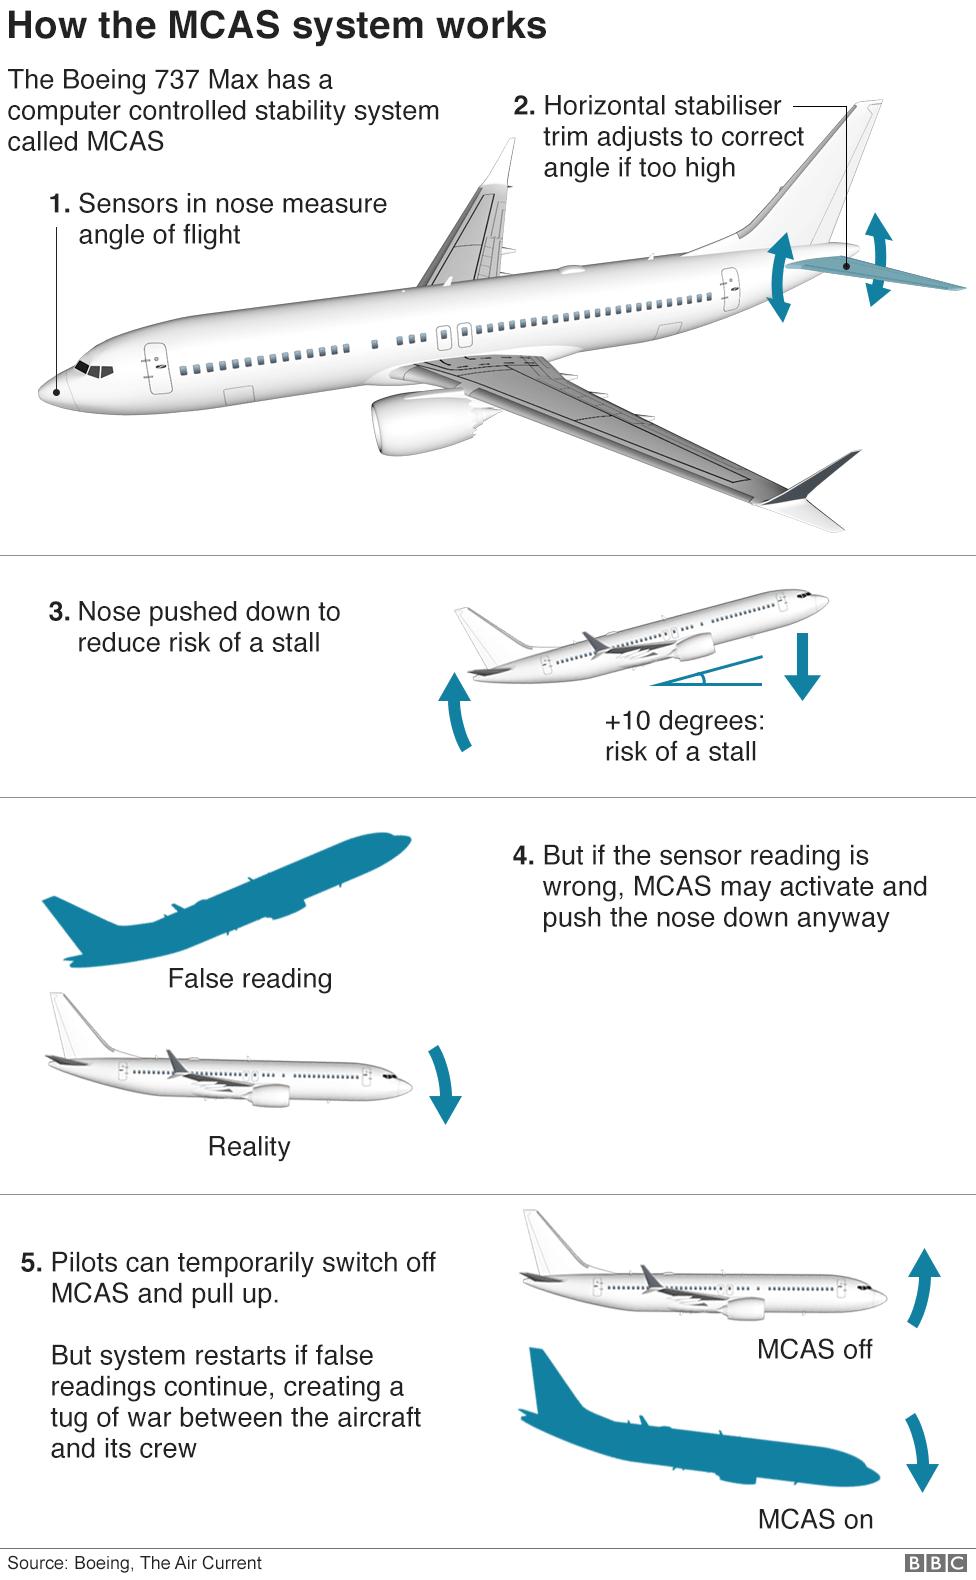 Victims' families slam report into 737 Max crashes